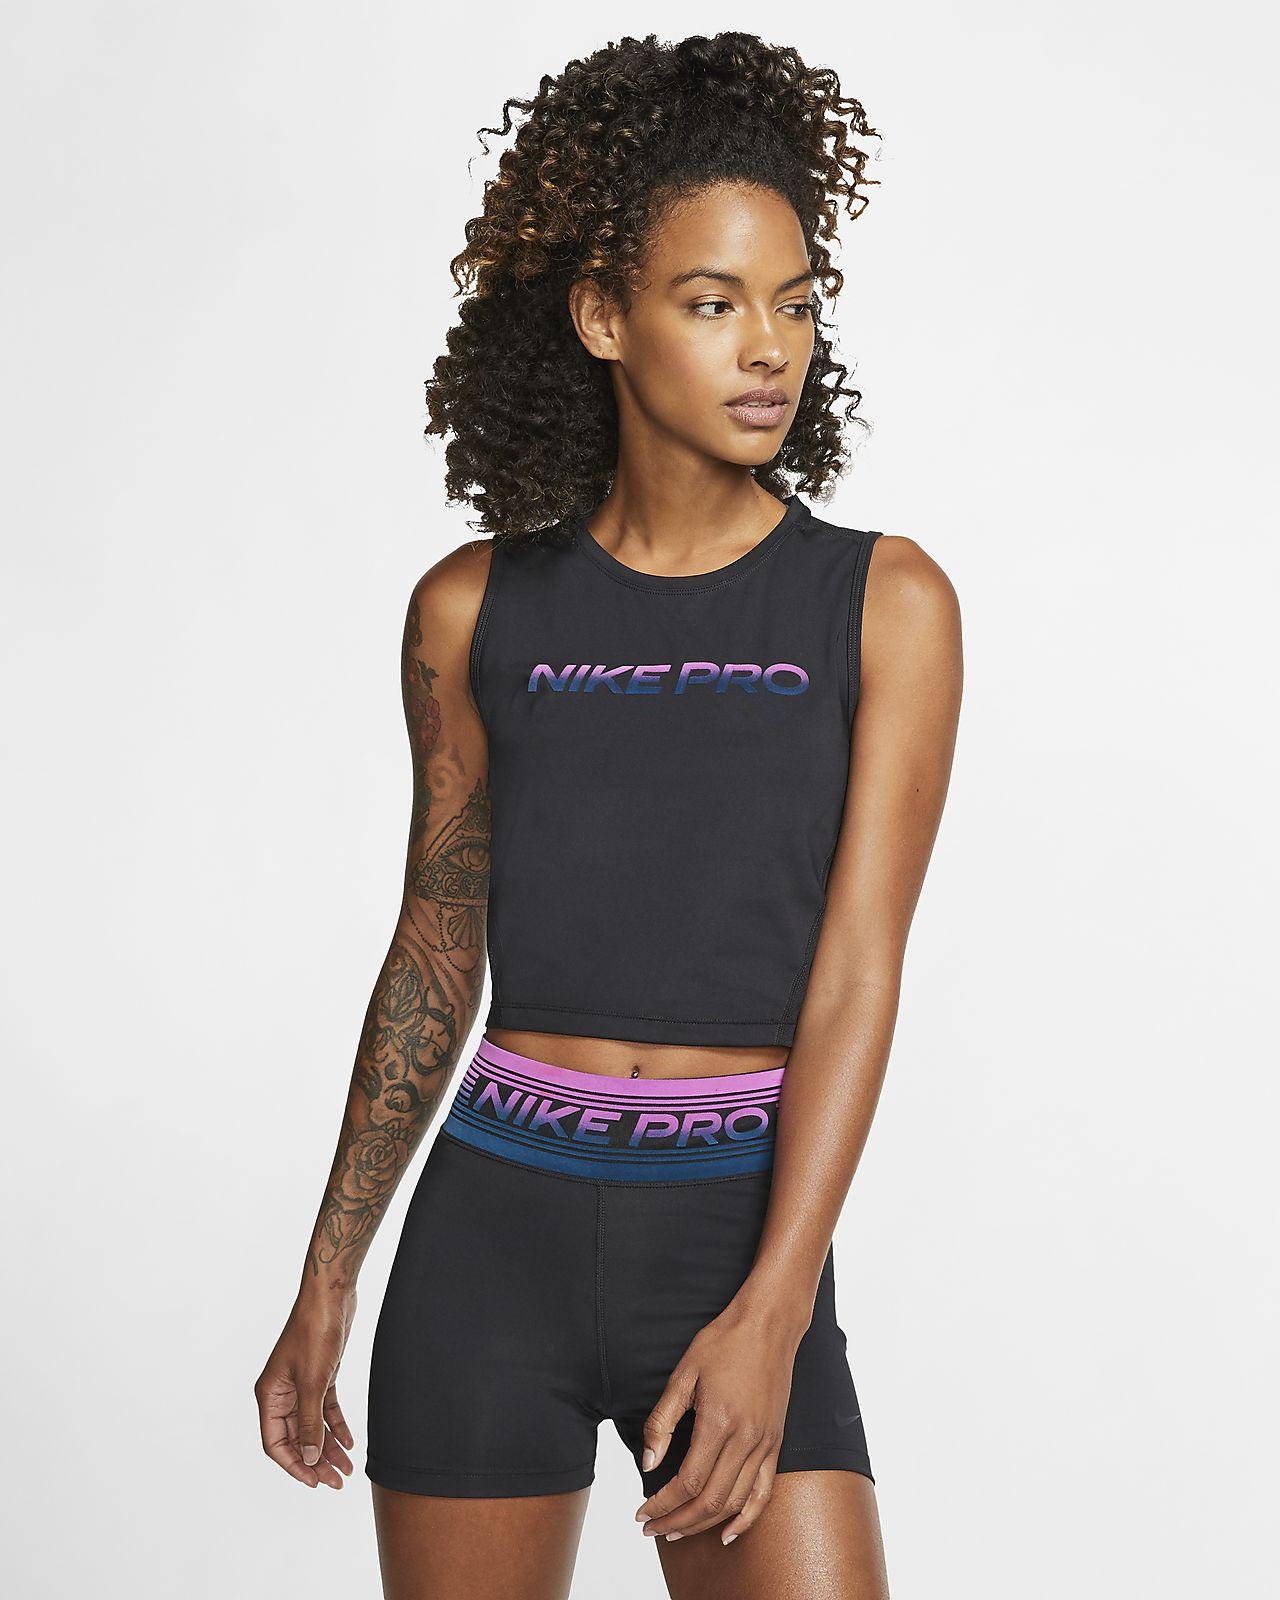 Nike Pro Women's Cropped Tank